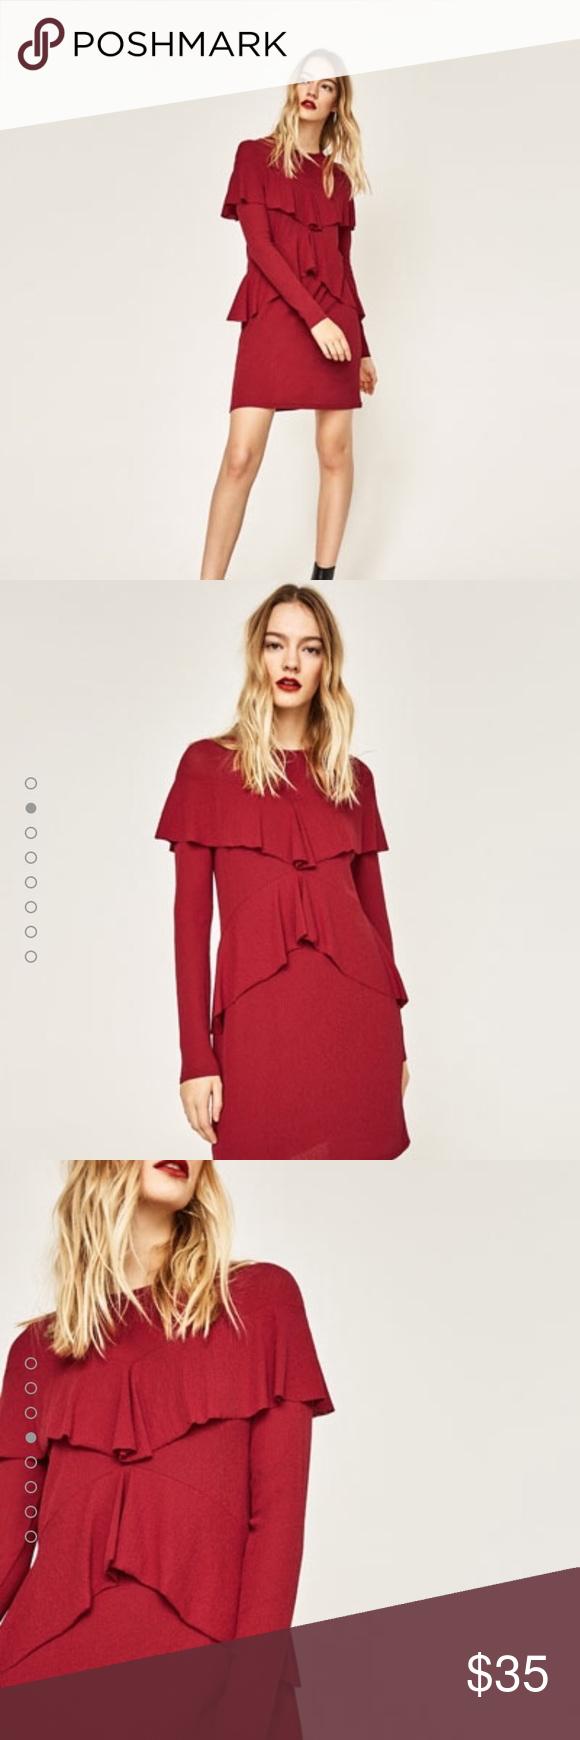 Zara red dress new no tags zara red dress zara dresses and ffa